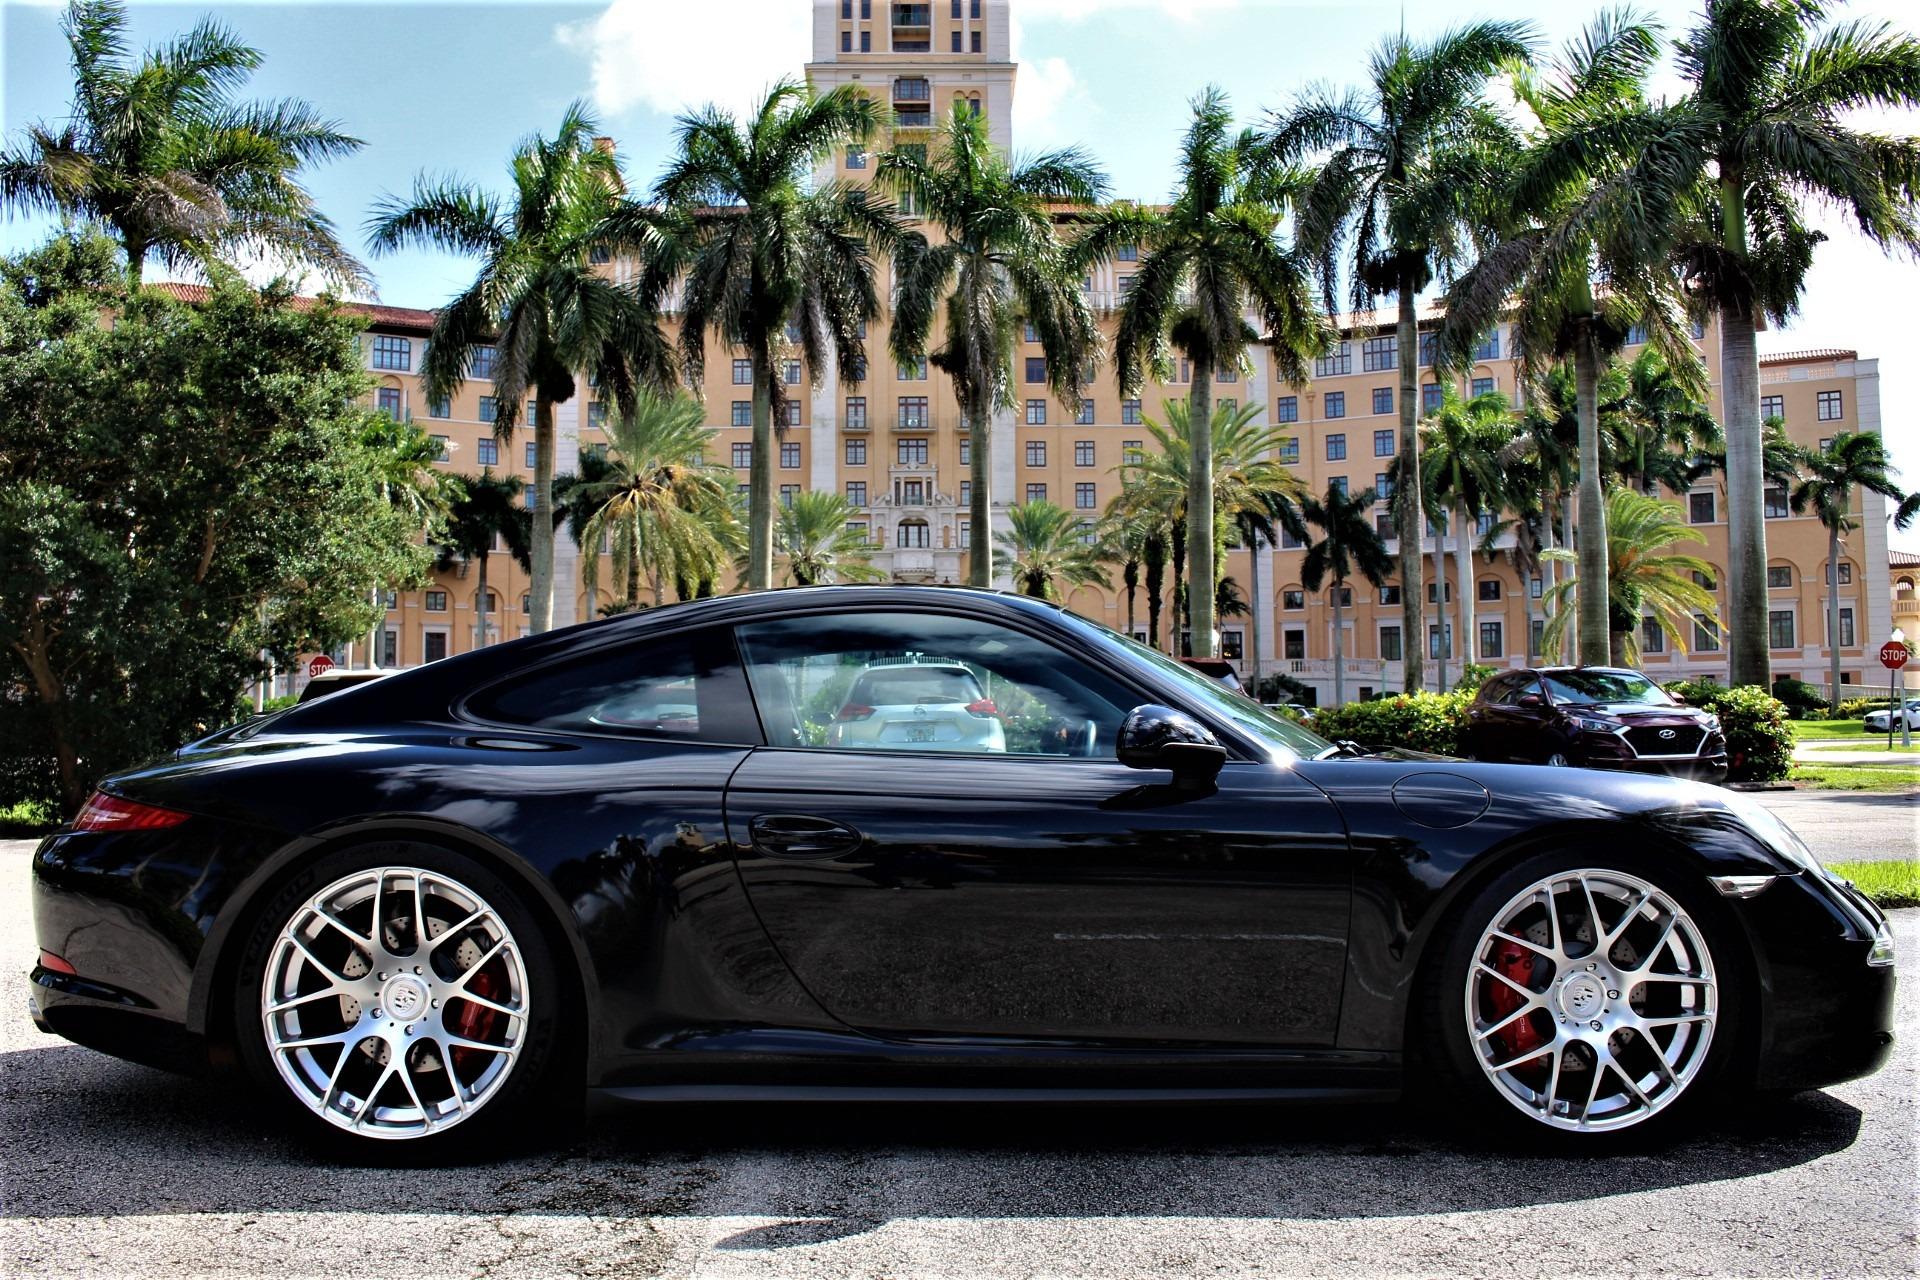 Used 2013 Porsche 911 Carrera 4S for sale $93,850 at The Gables Sports Cars in Miami FL 33146 1